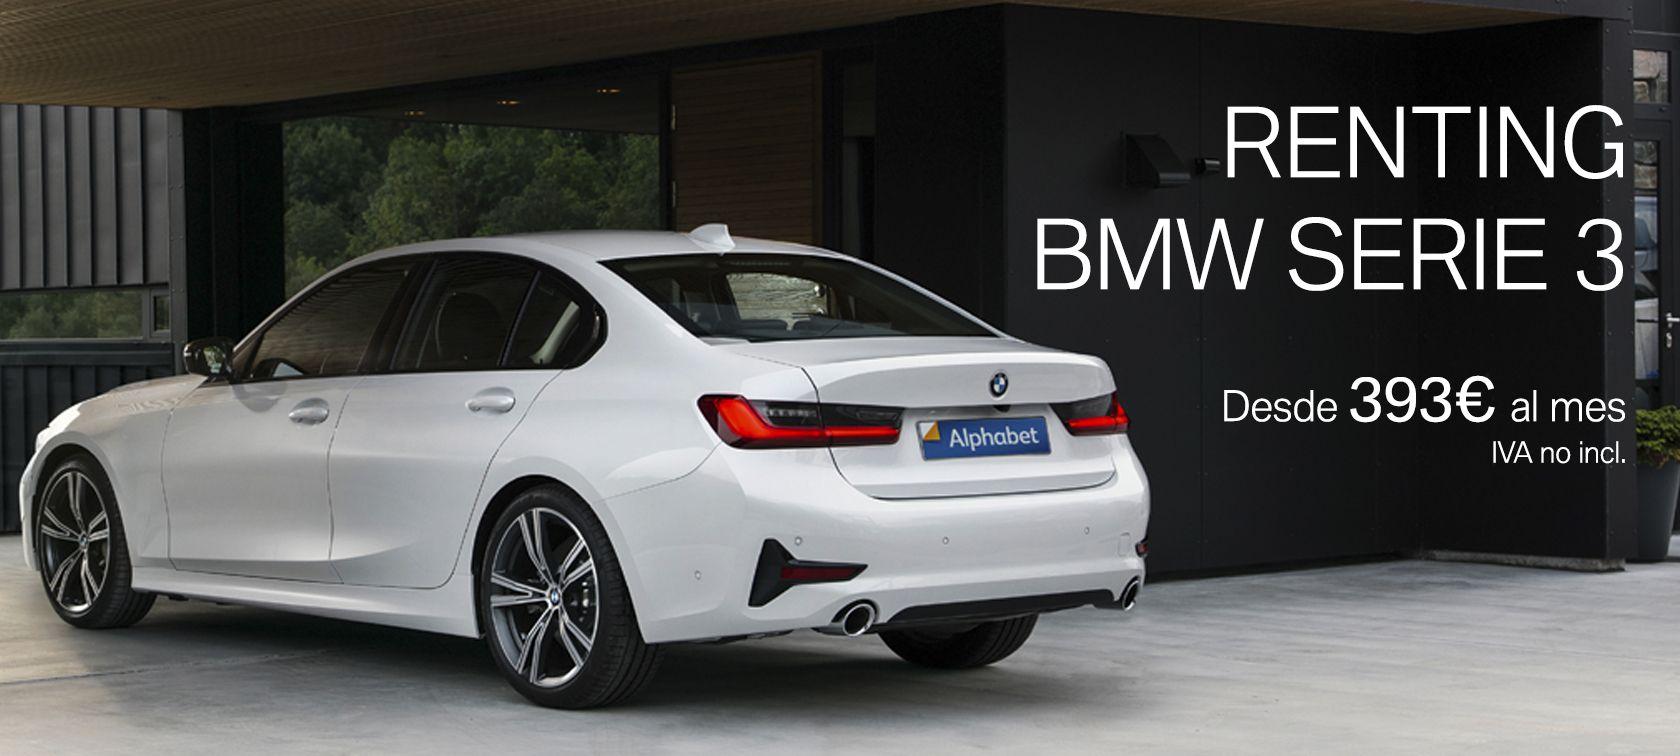 RENTING NUEVO BMW SERIE 3